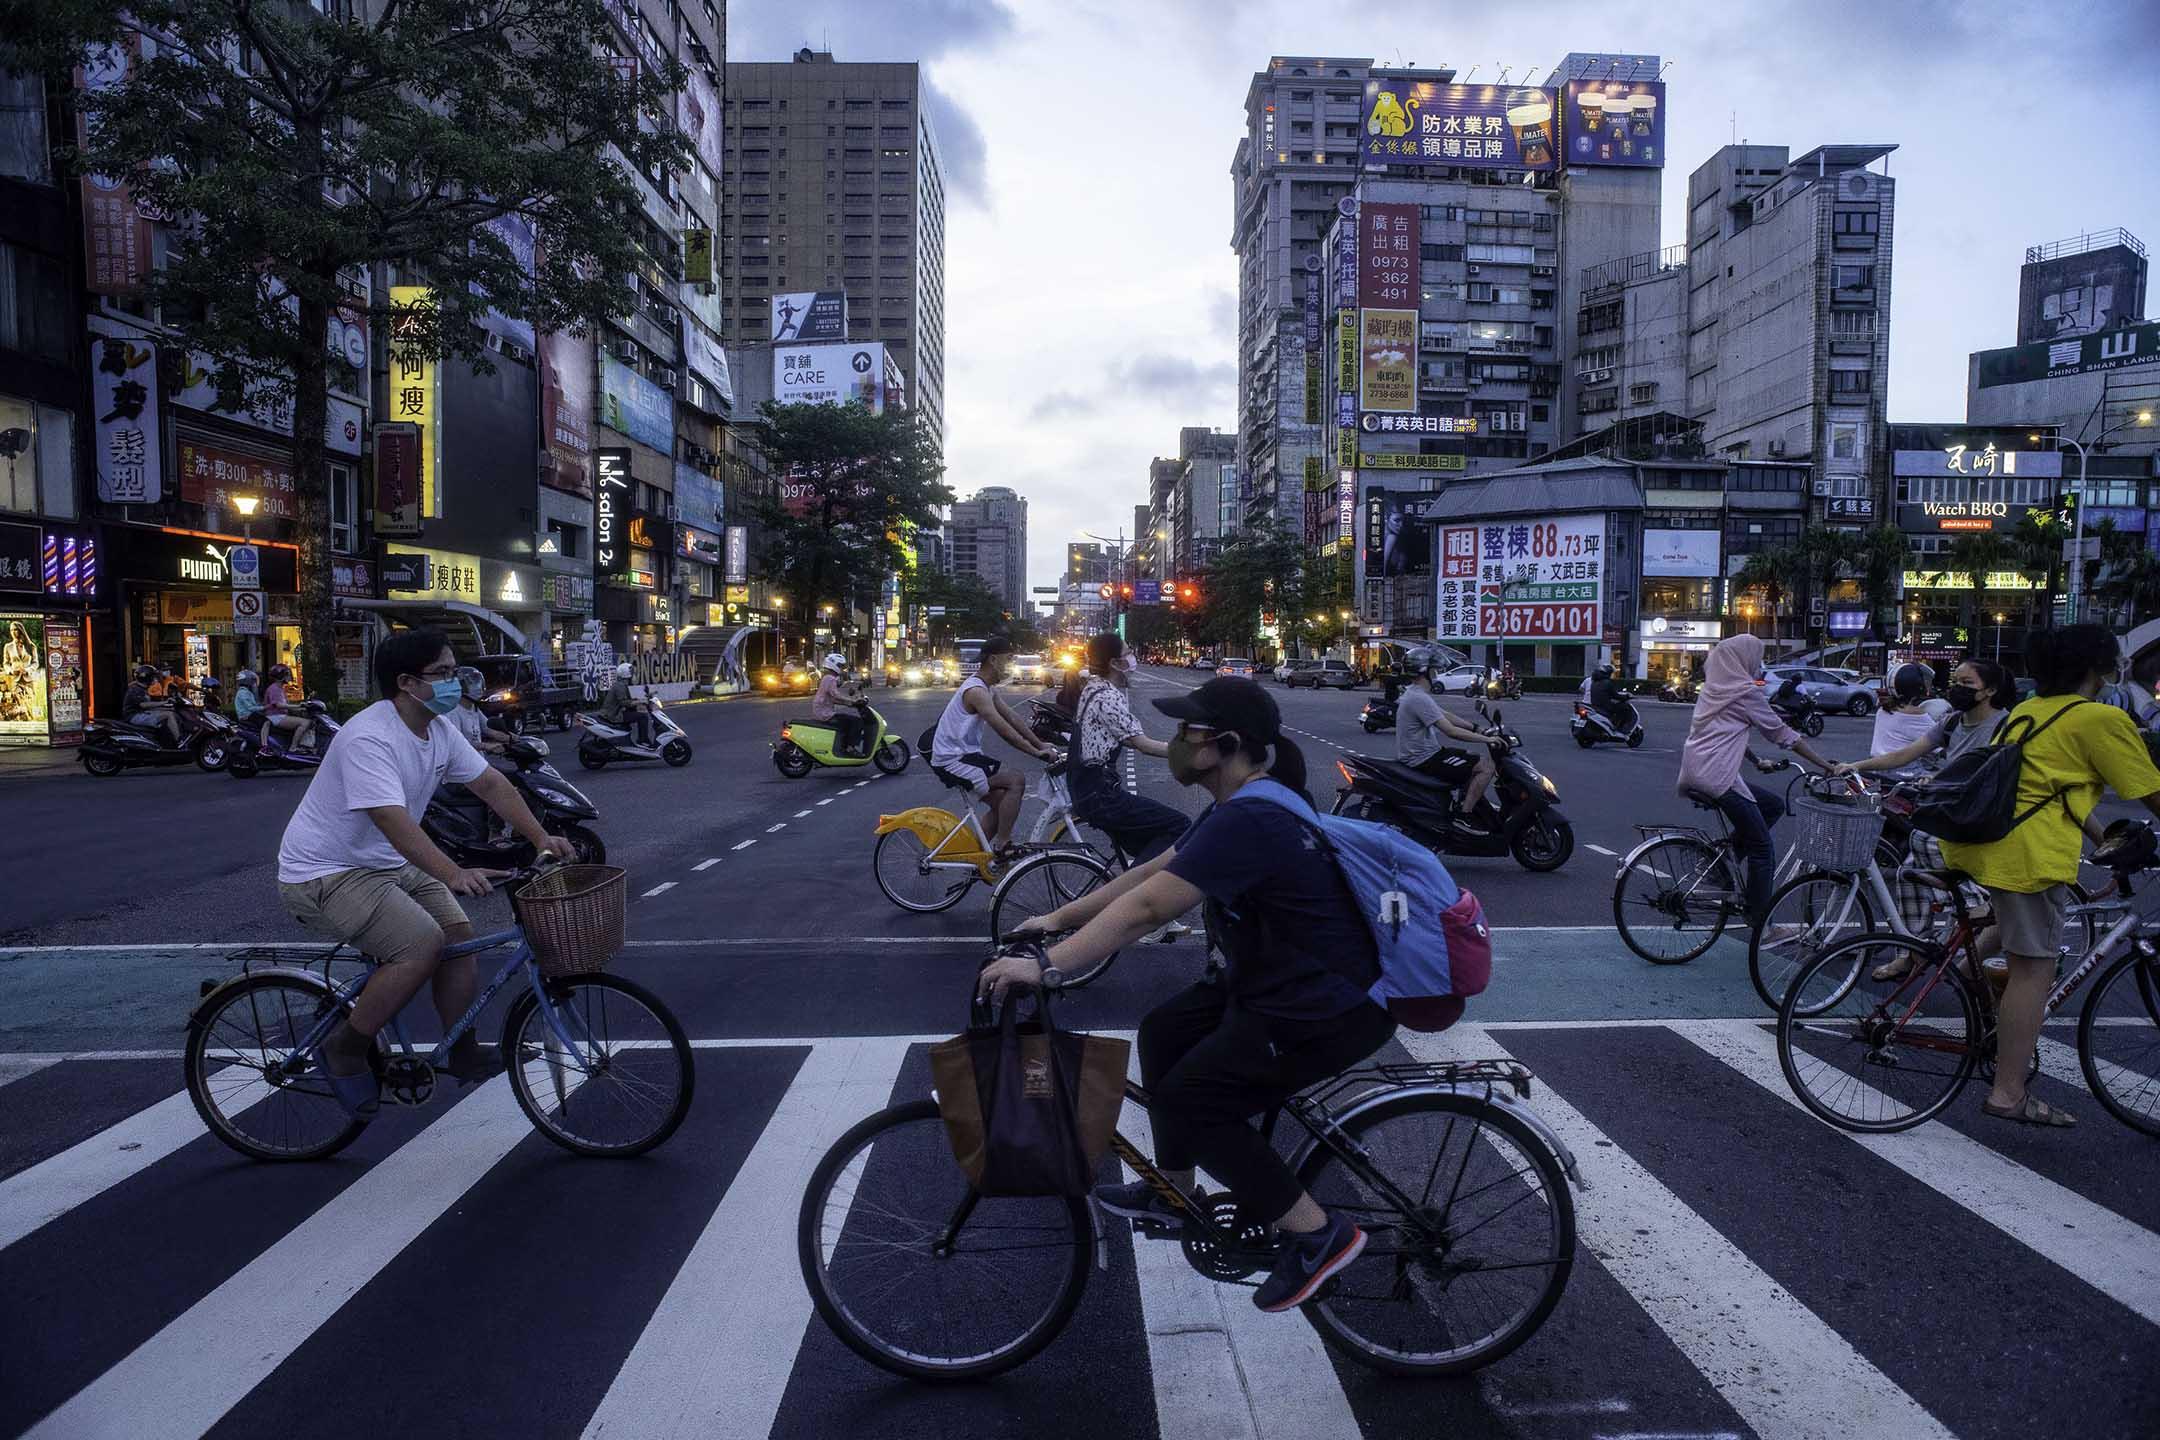 2021年7月20日台灣台北,人們騎著自行車橫過馬路。 攝:Shih Hsun Chao/LightRocket via Getty Images